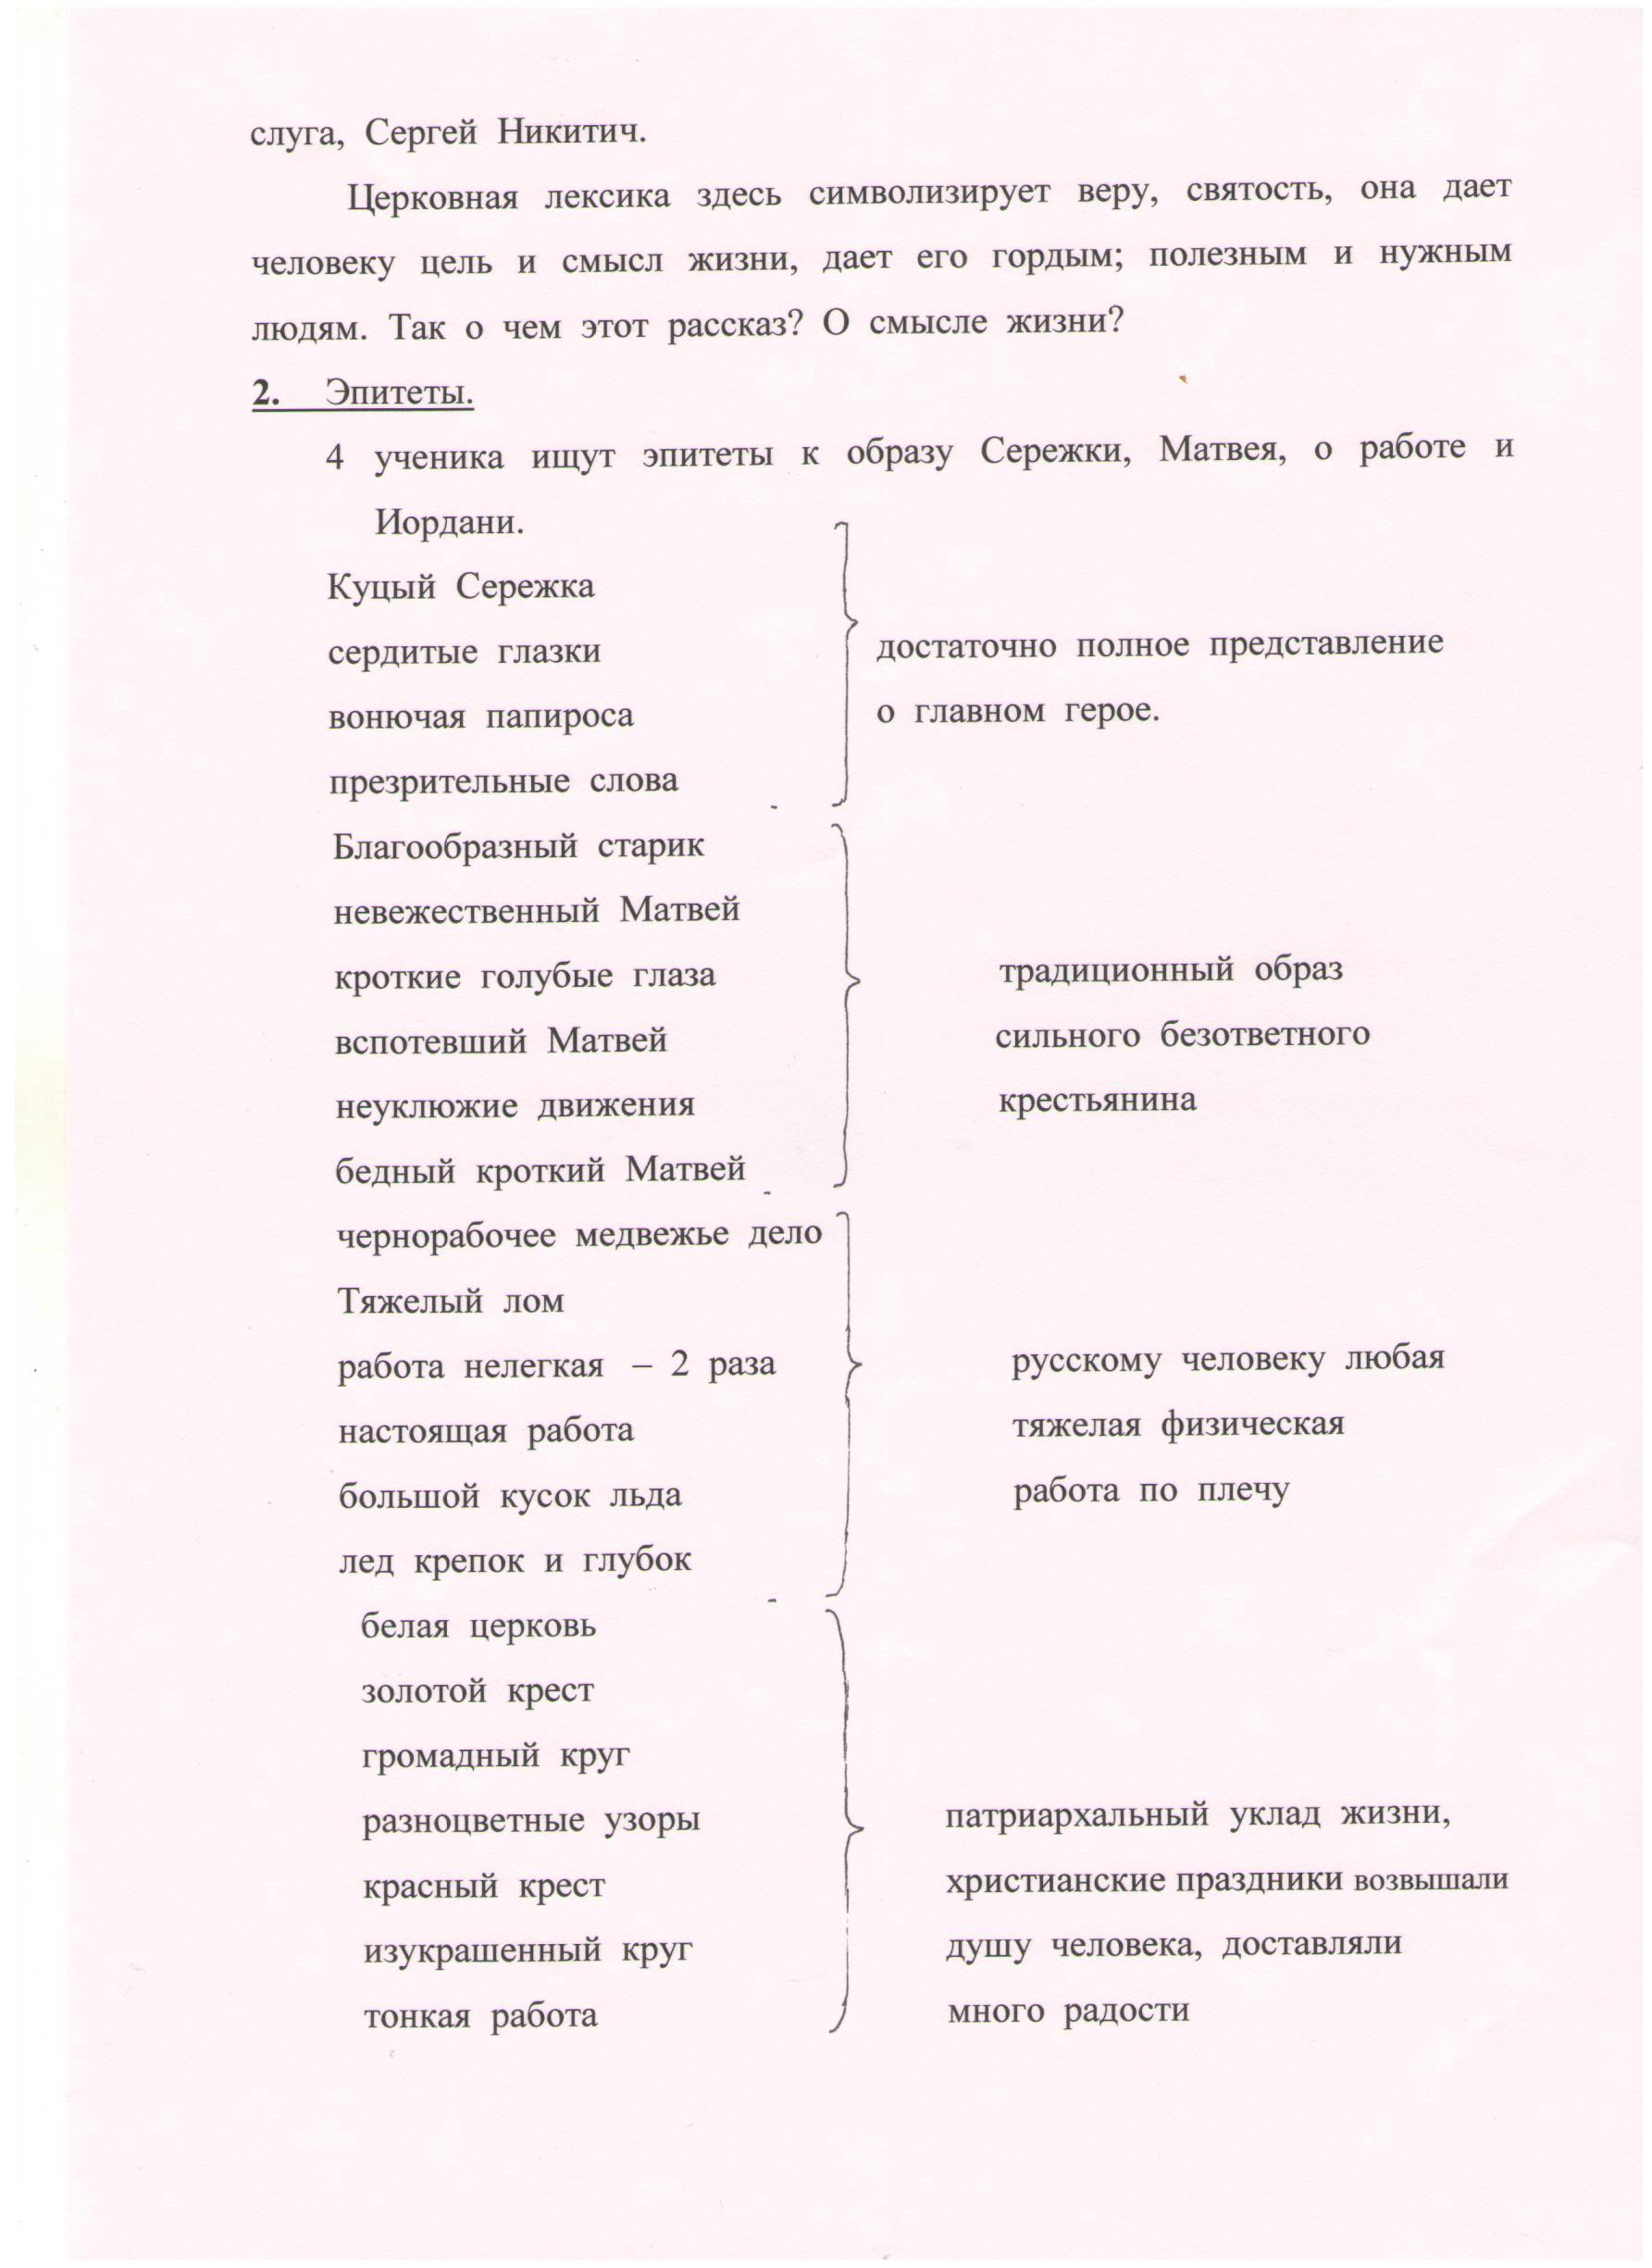 C:\Documents and Settings\Учитель\Рабочий стол\Новая папка\Работа 18 аа.jpg